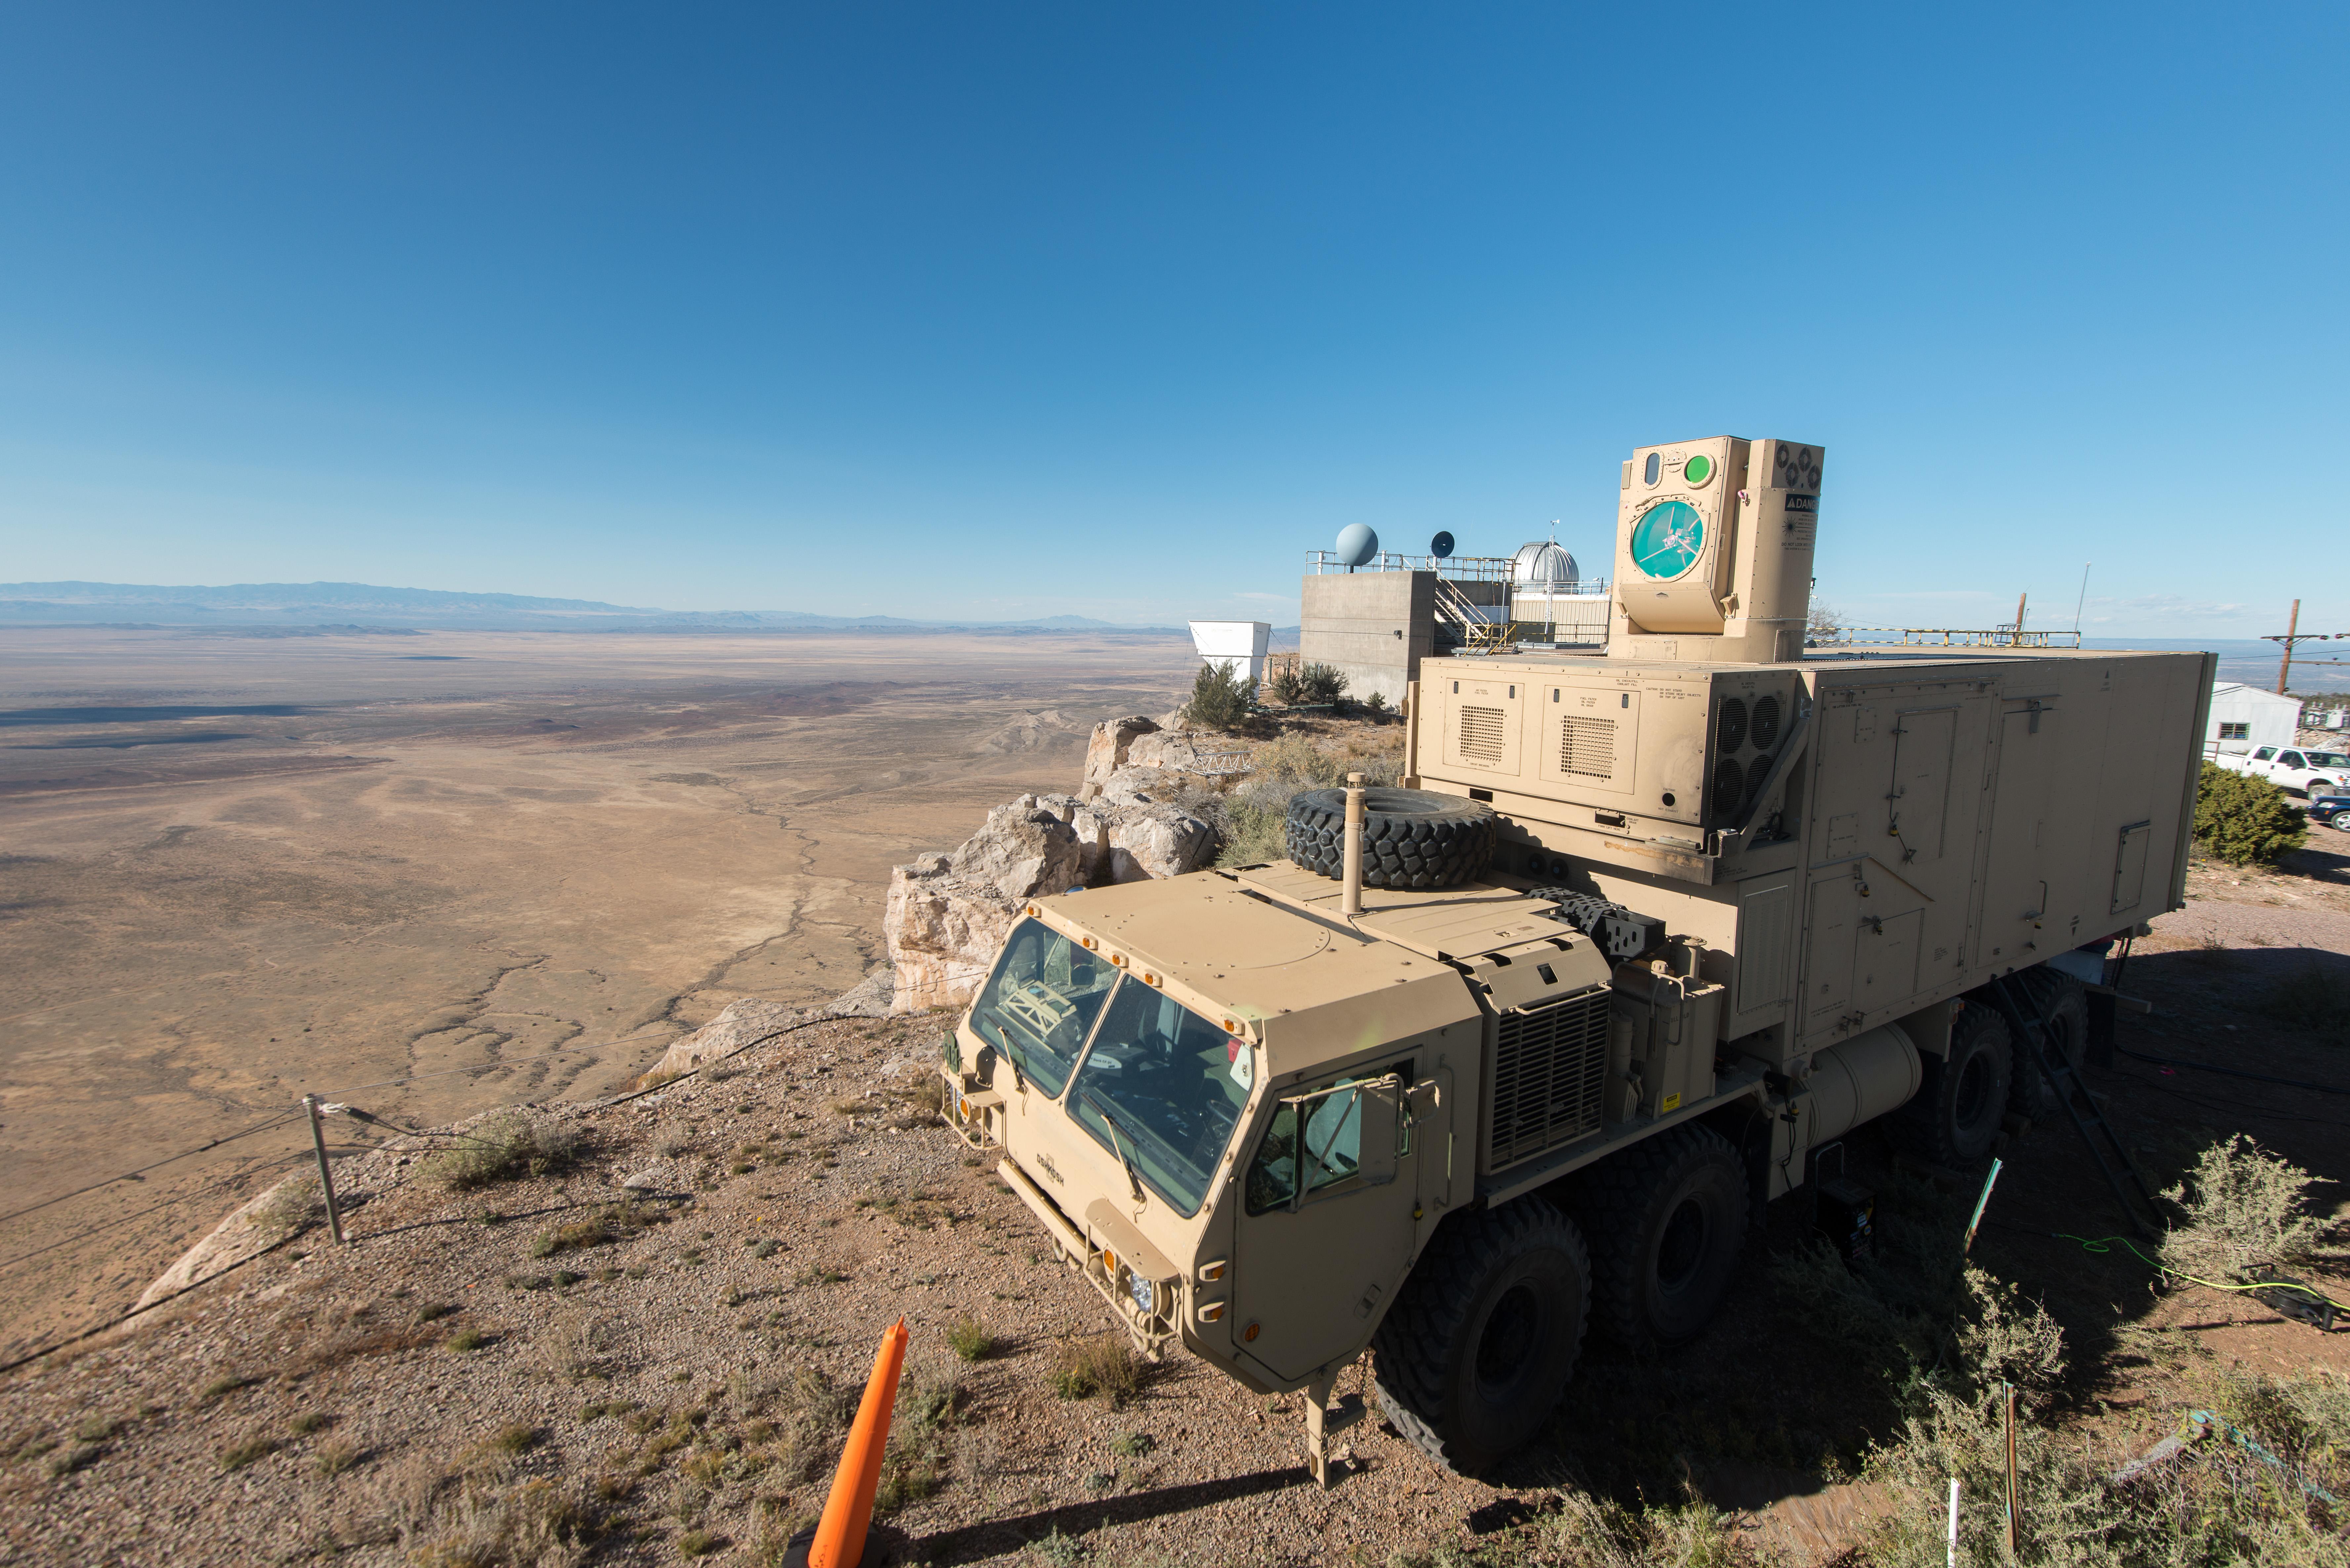 High Energy Laser Weapons Target Uavs